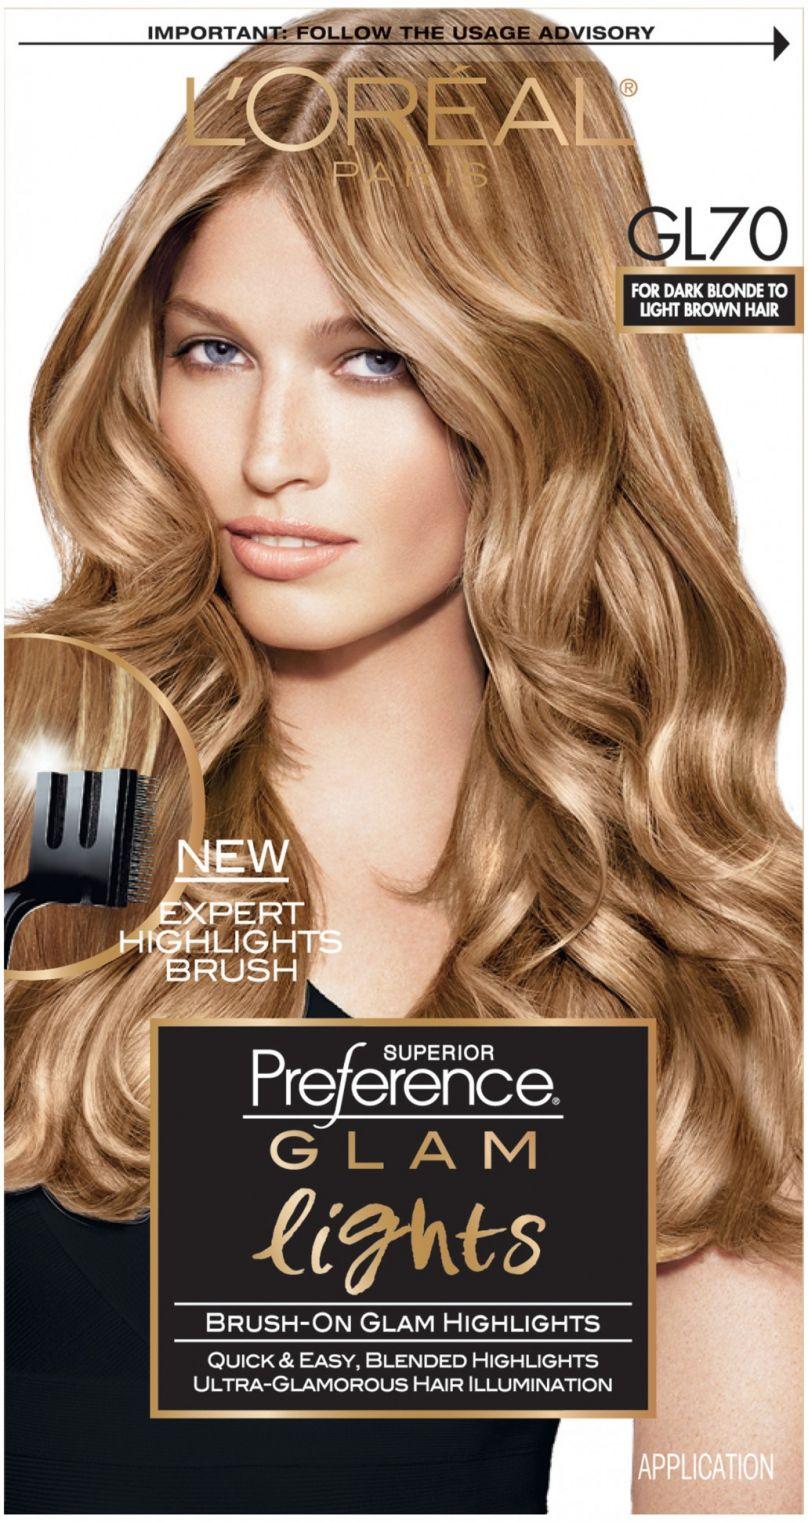 Loreal Hair Color Golden Blonde Best Safe Hair Color Check More At Http Www Fitnursetaylor Com Loreal H Hair Color Brands Boxed Hair Color Dyed Blonde Hair